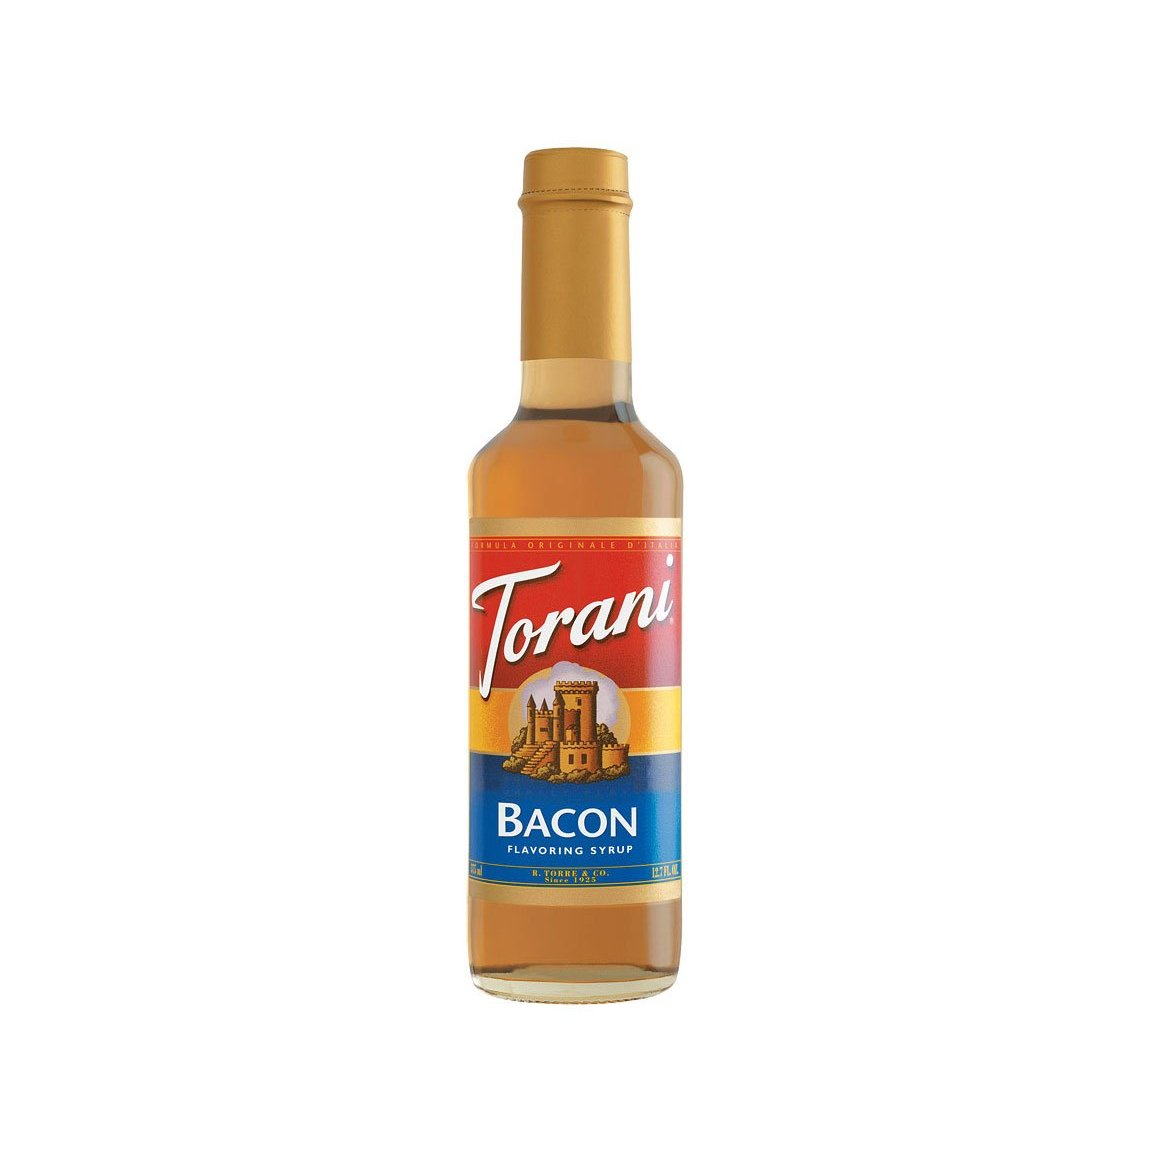 Torani bacon%20syrup